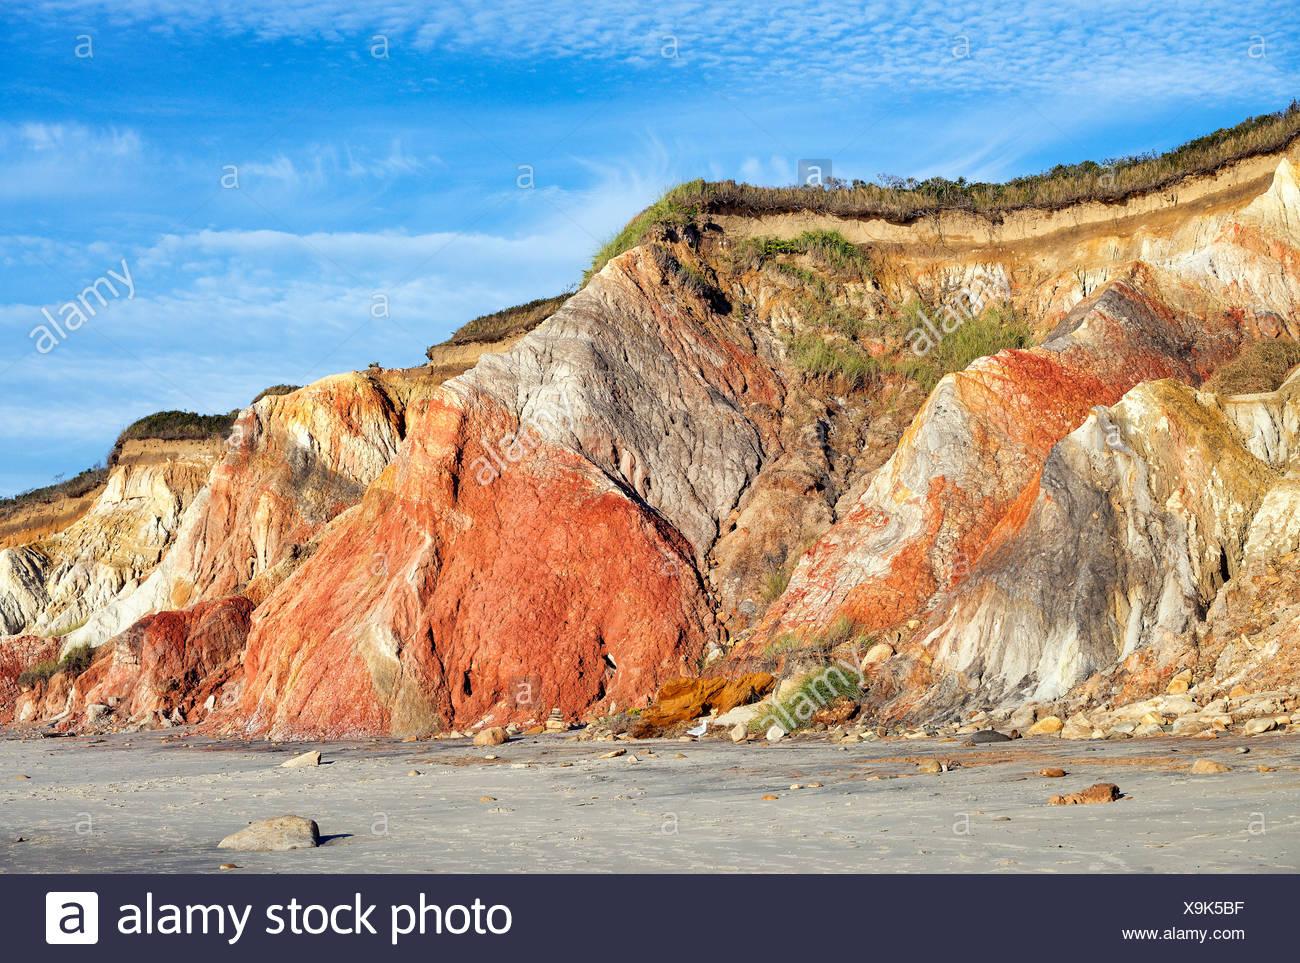 Clay cliffs, Gay Head, Aquinnah, Martha's Vineyard, Massachusetts, USA. - Stock Image